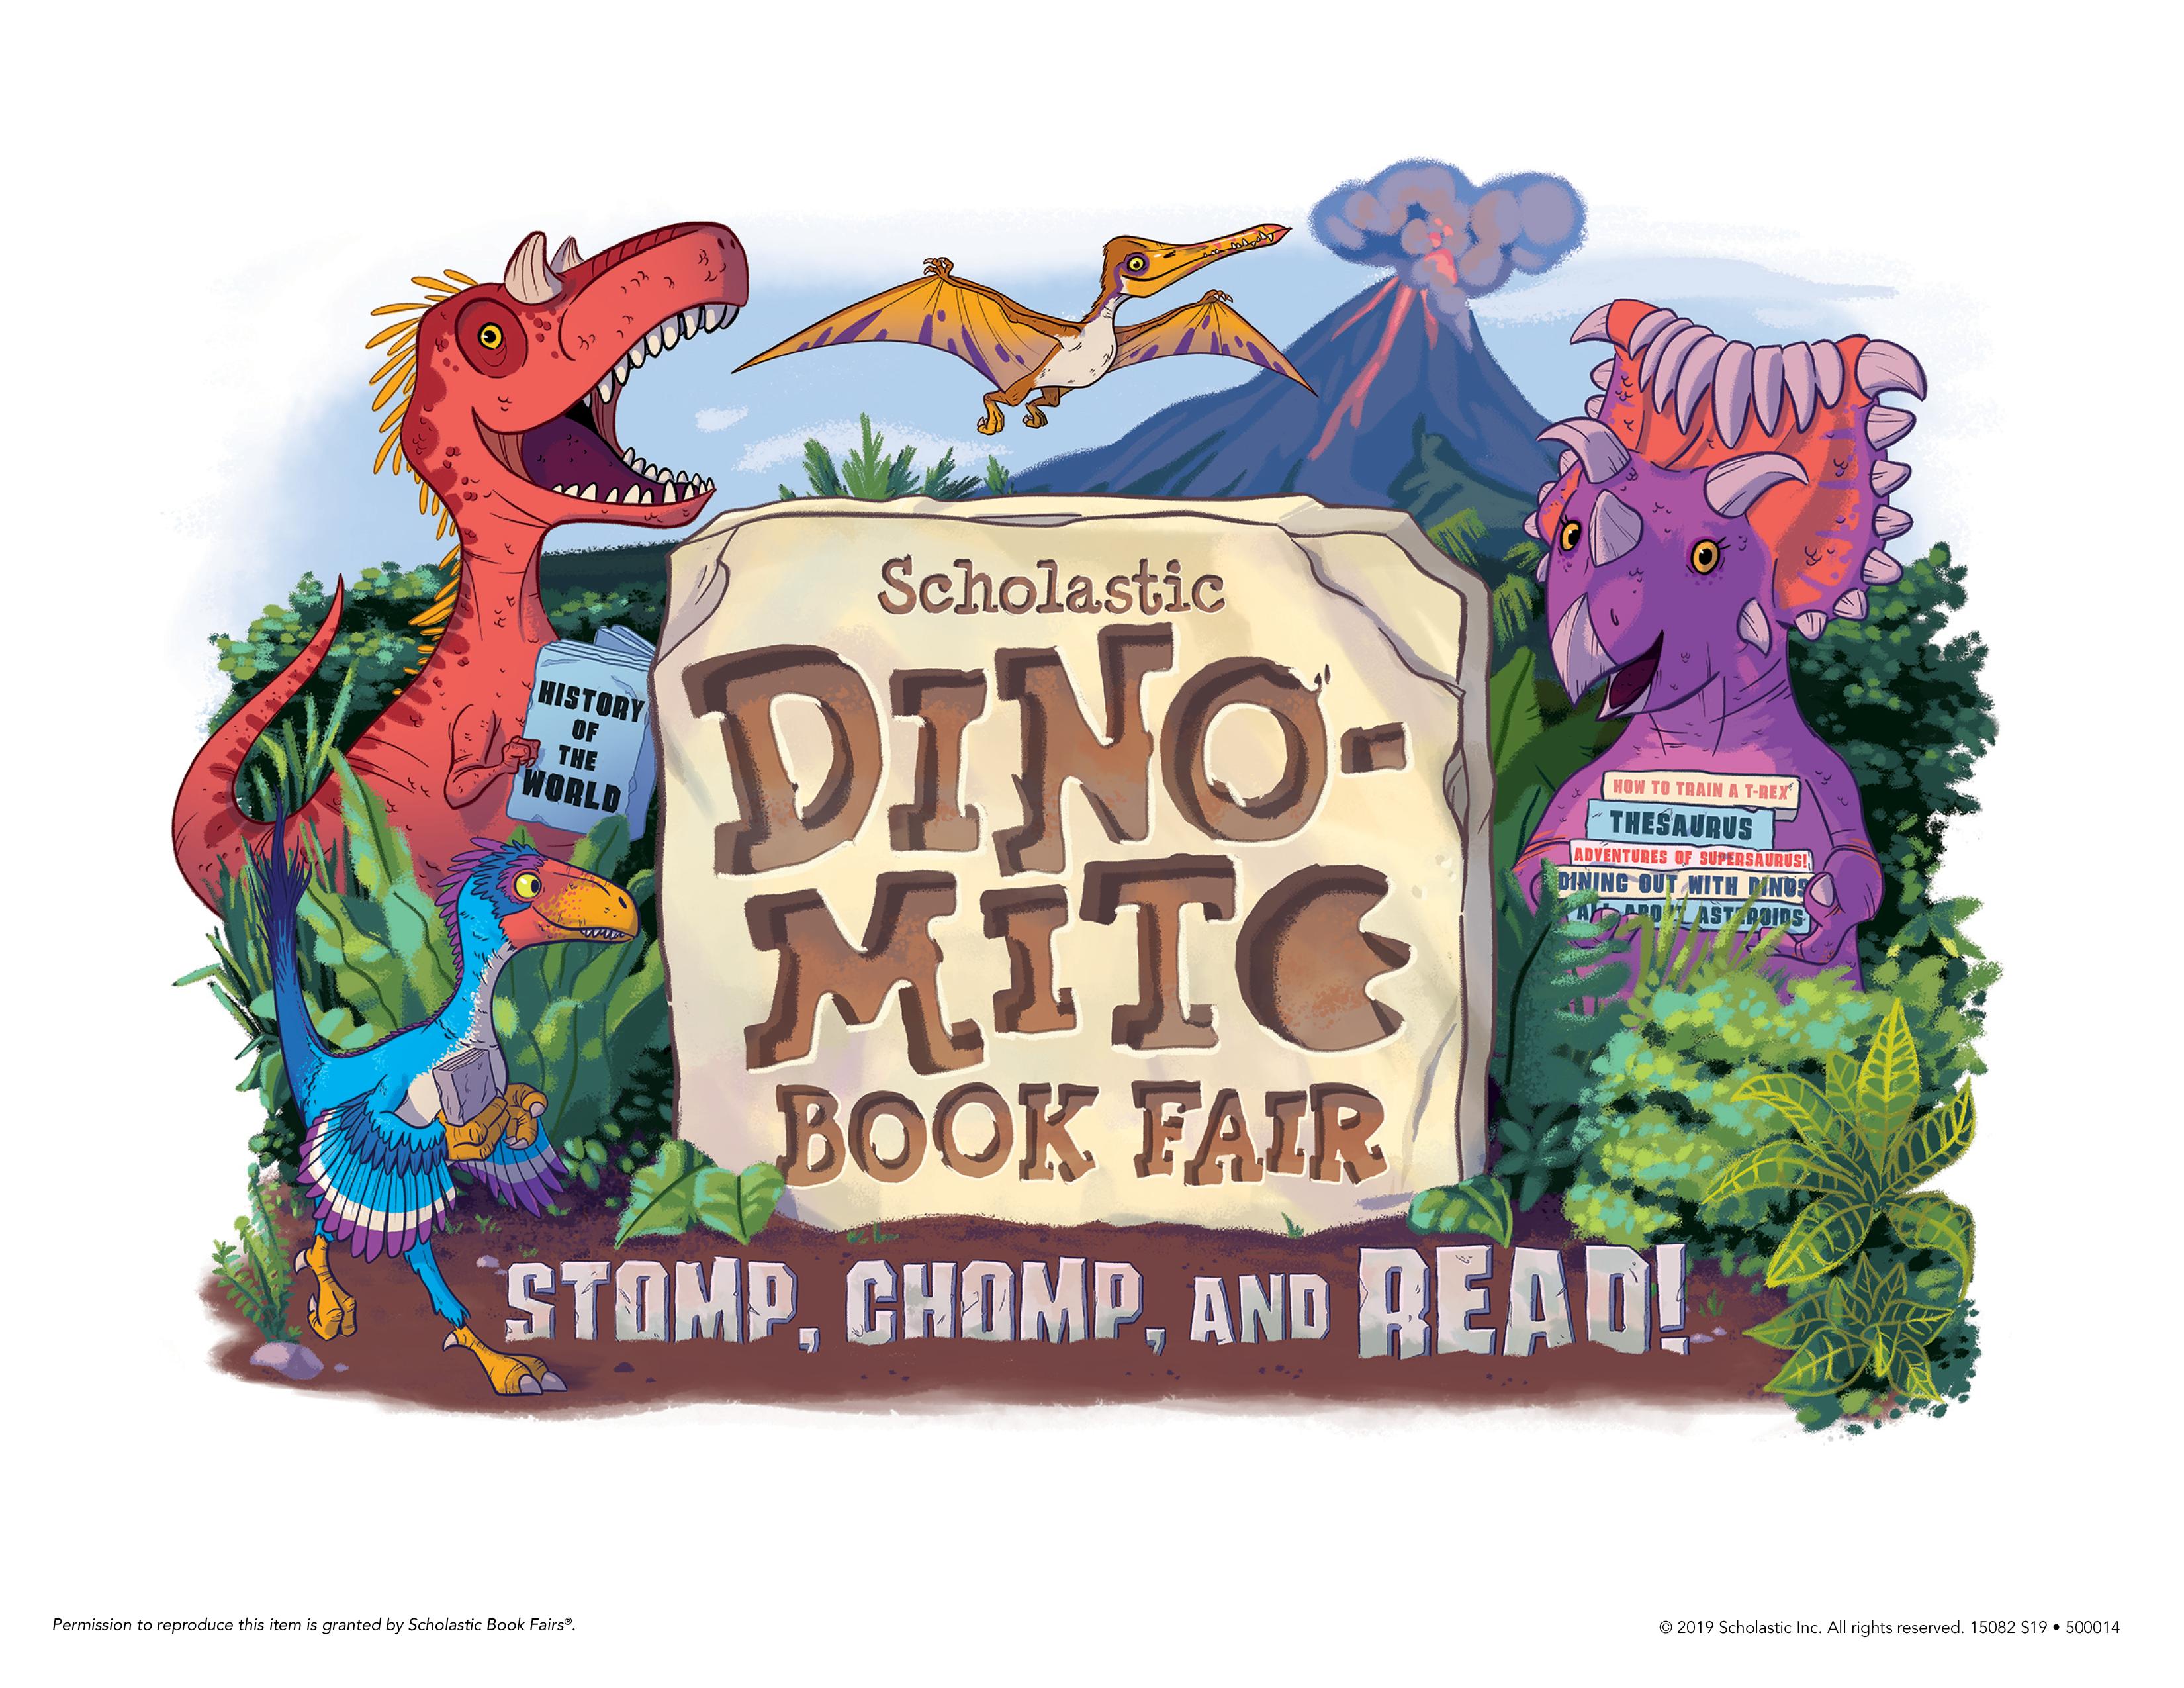 Scholastic Book Fair theme